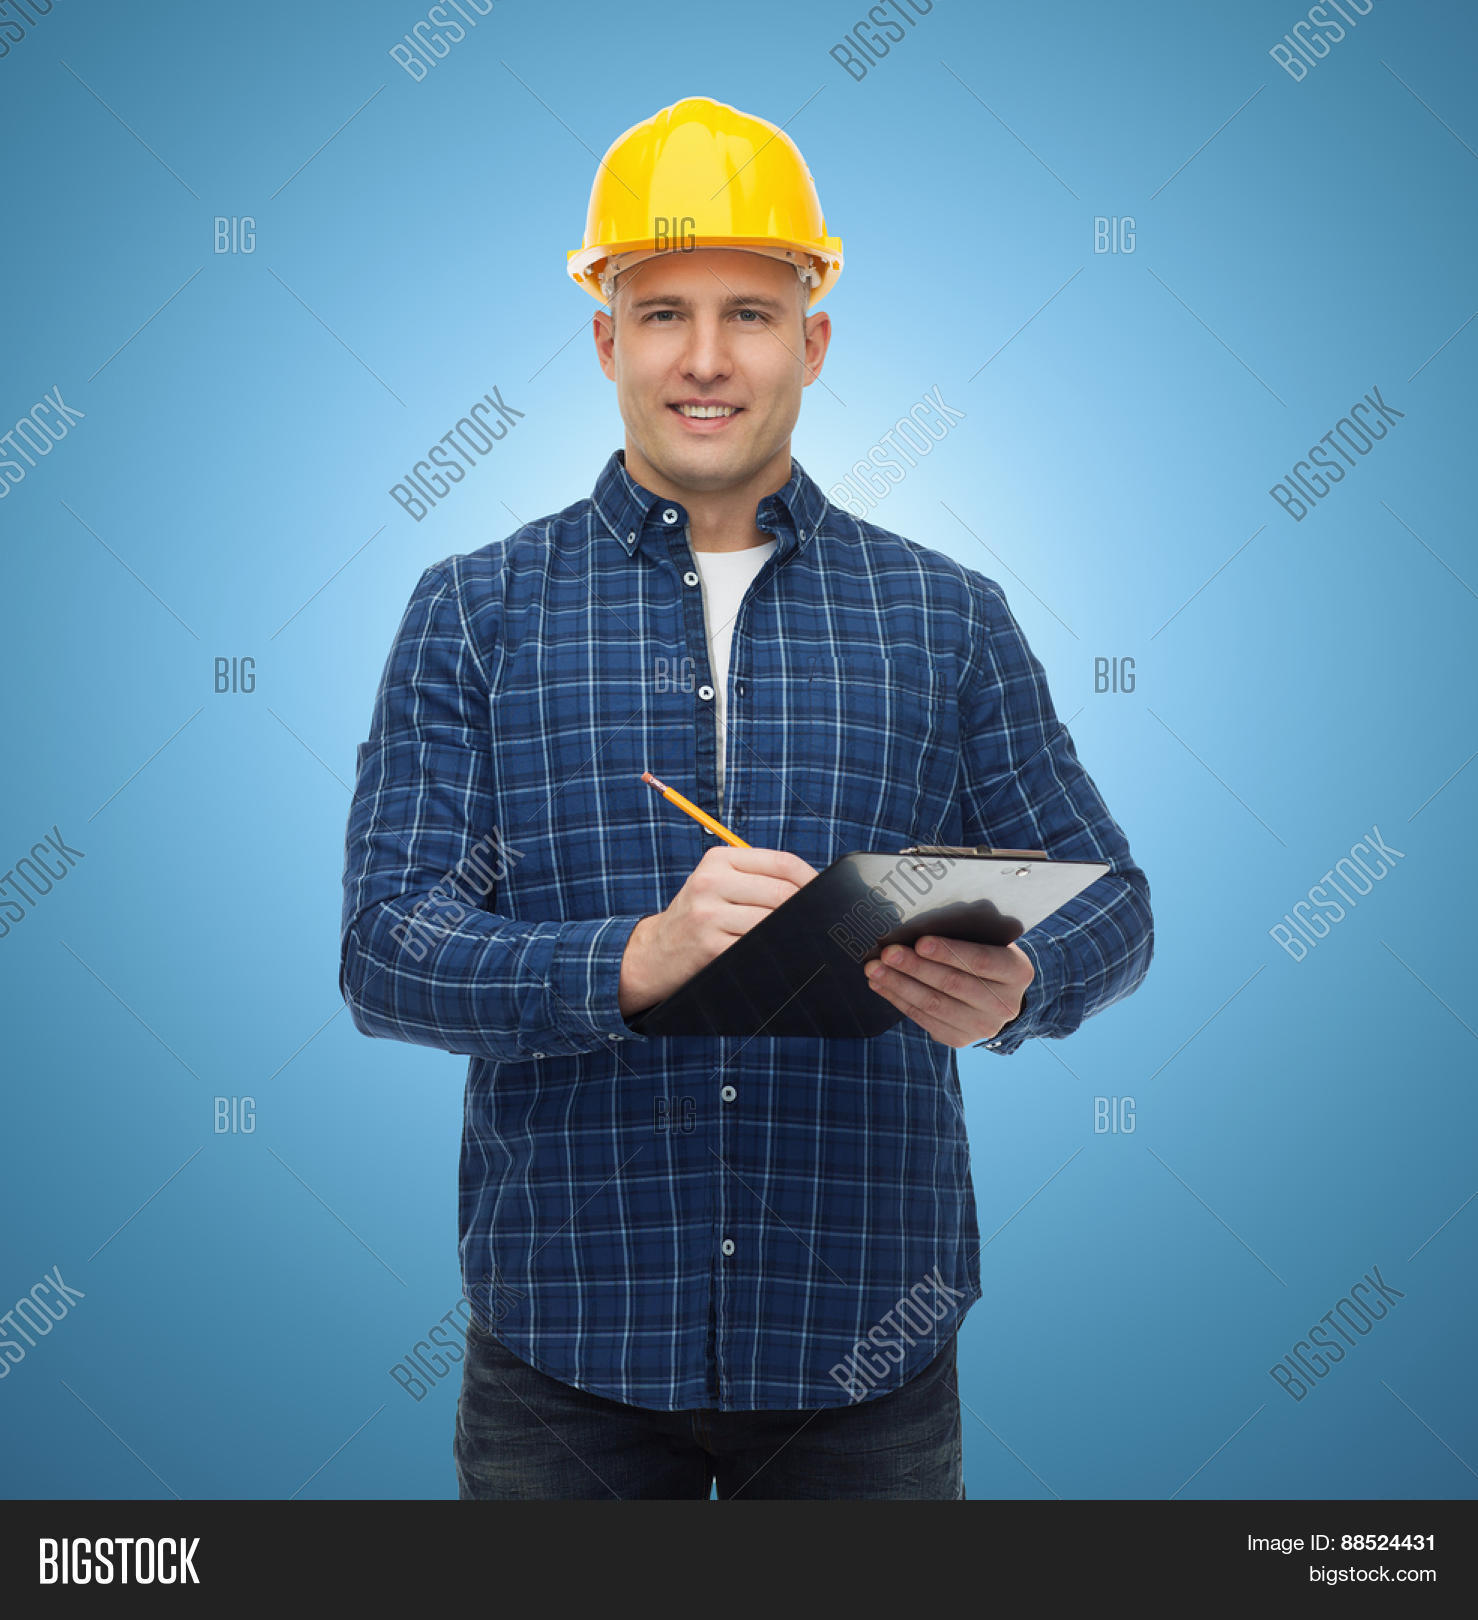 Repair, Construction, Image & Photo (Free Trial) | Bigstock